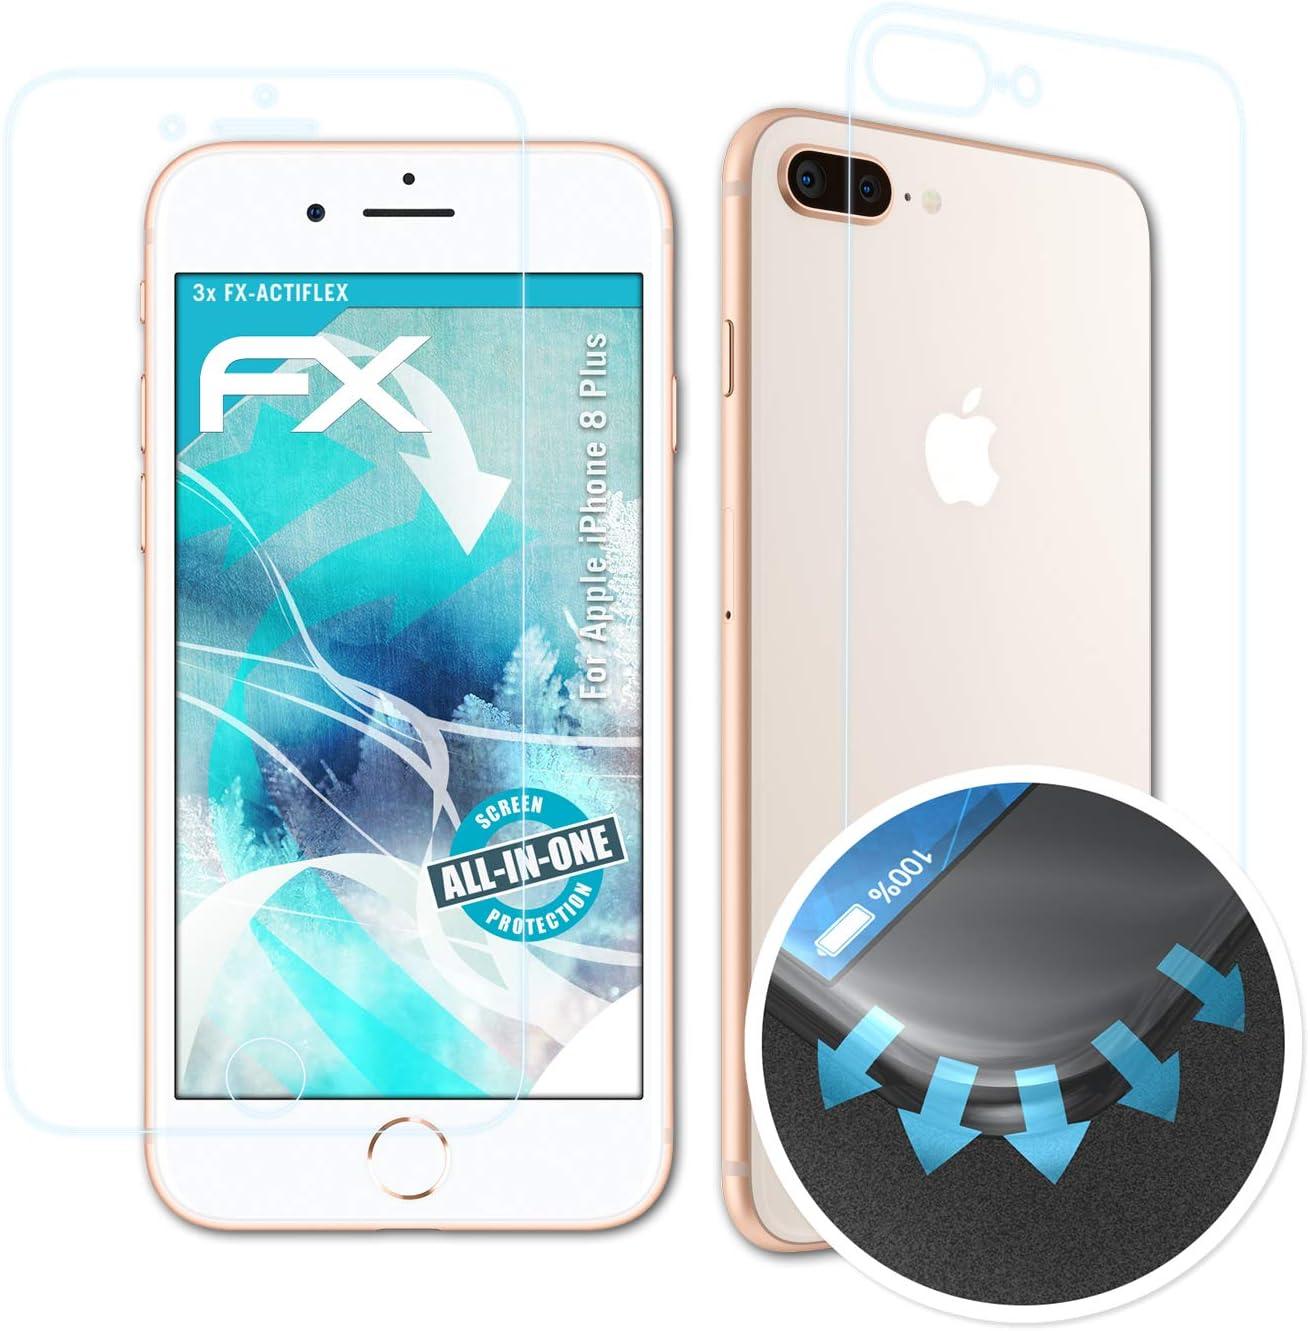 atFoliX Película Protectora Apto para Apple iPhone 8 Plus Protector Película, Ultra Claro y Flexible FX Lámina Protectora de Pantalla (Set de 3): Amazon.es: Electrónica